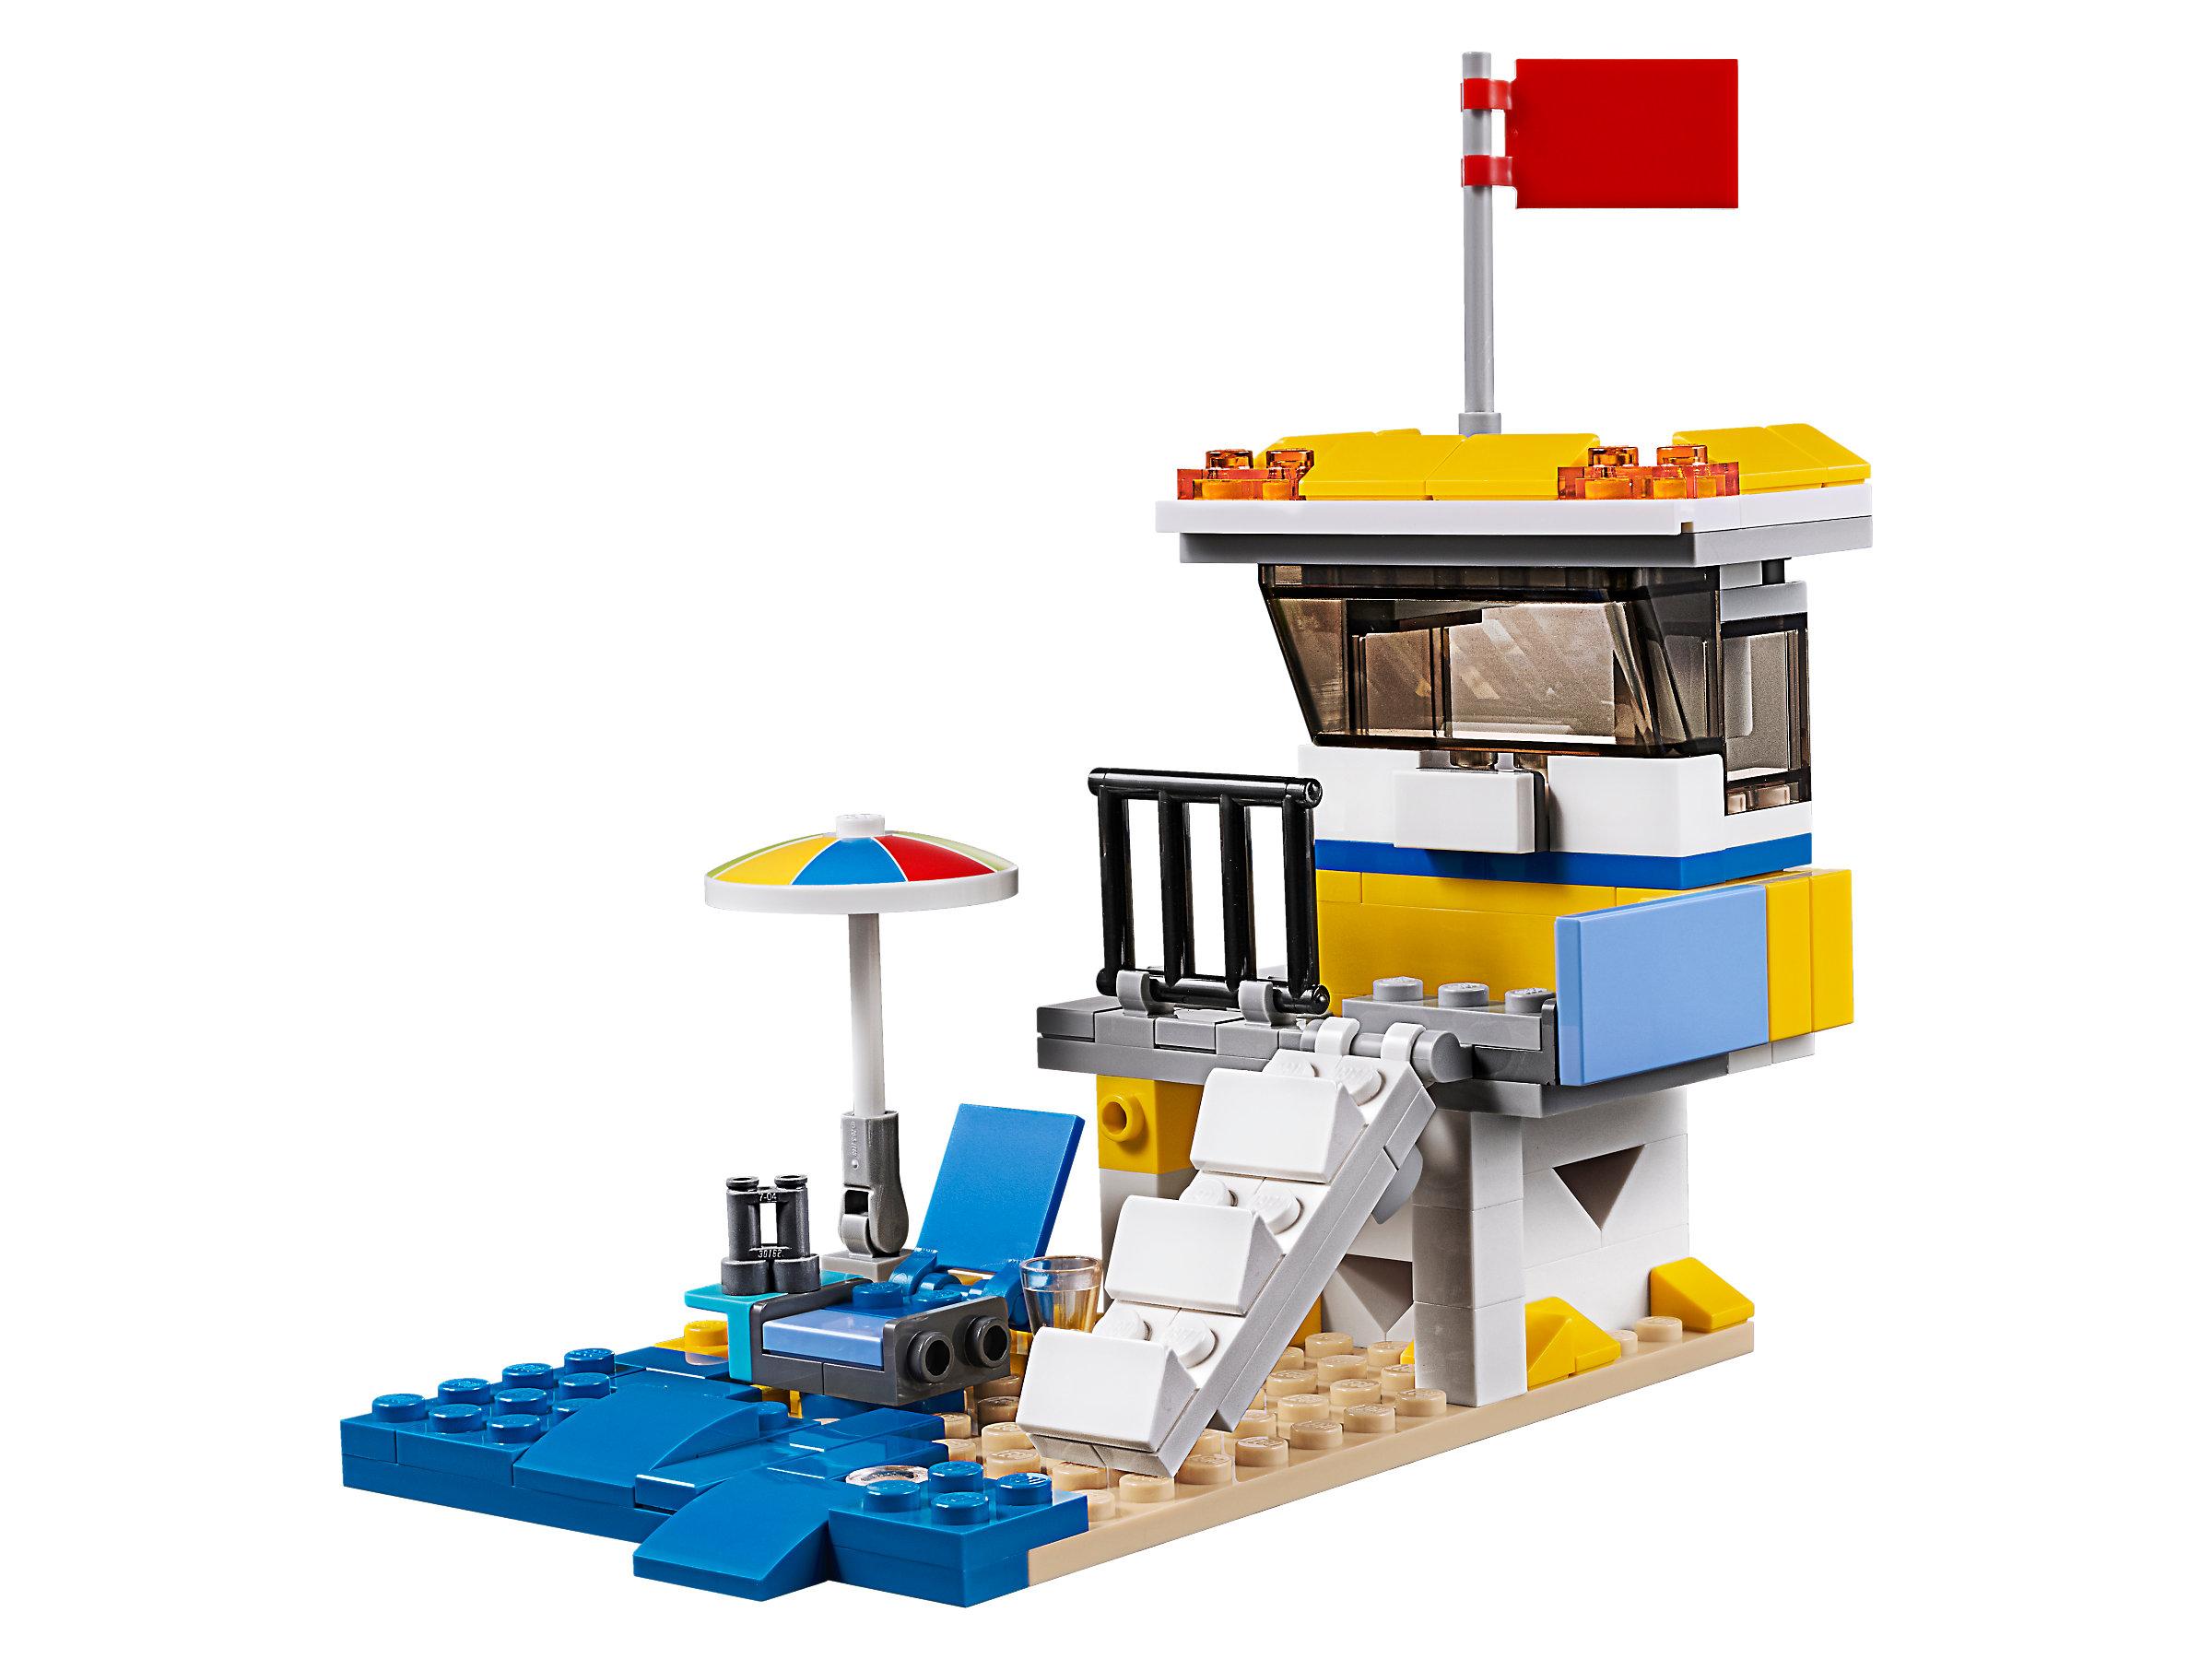 LEGO Creator 3 in 1 Sunshine Surfer Van Block Building Toy Set